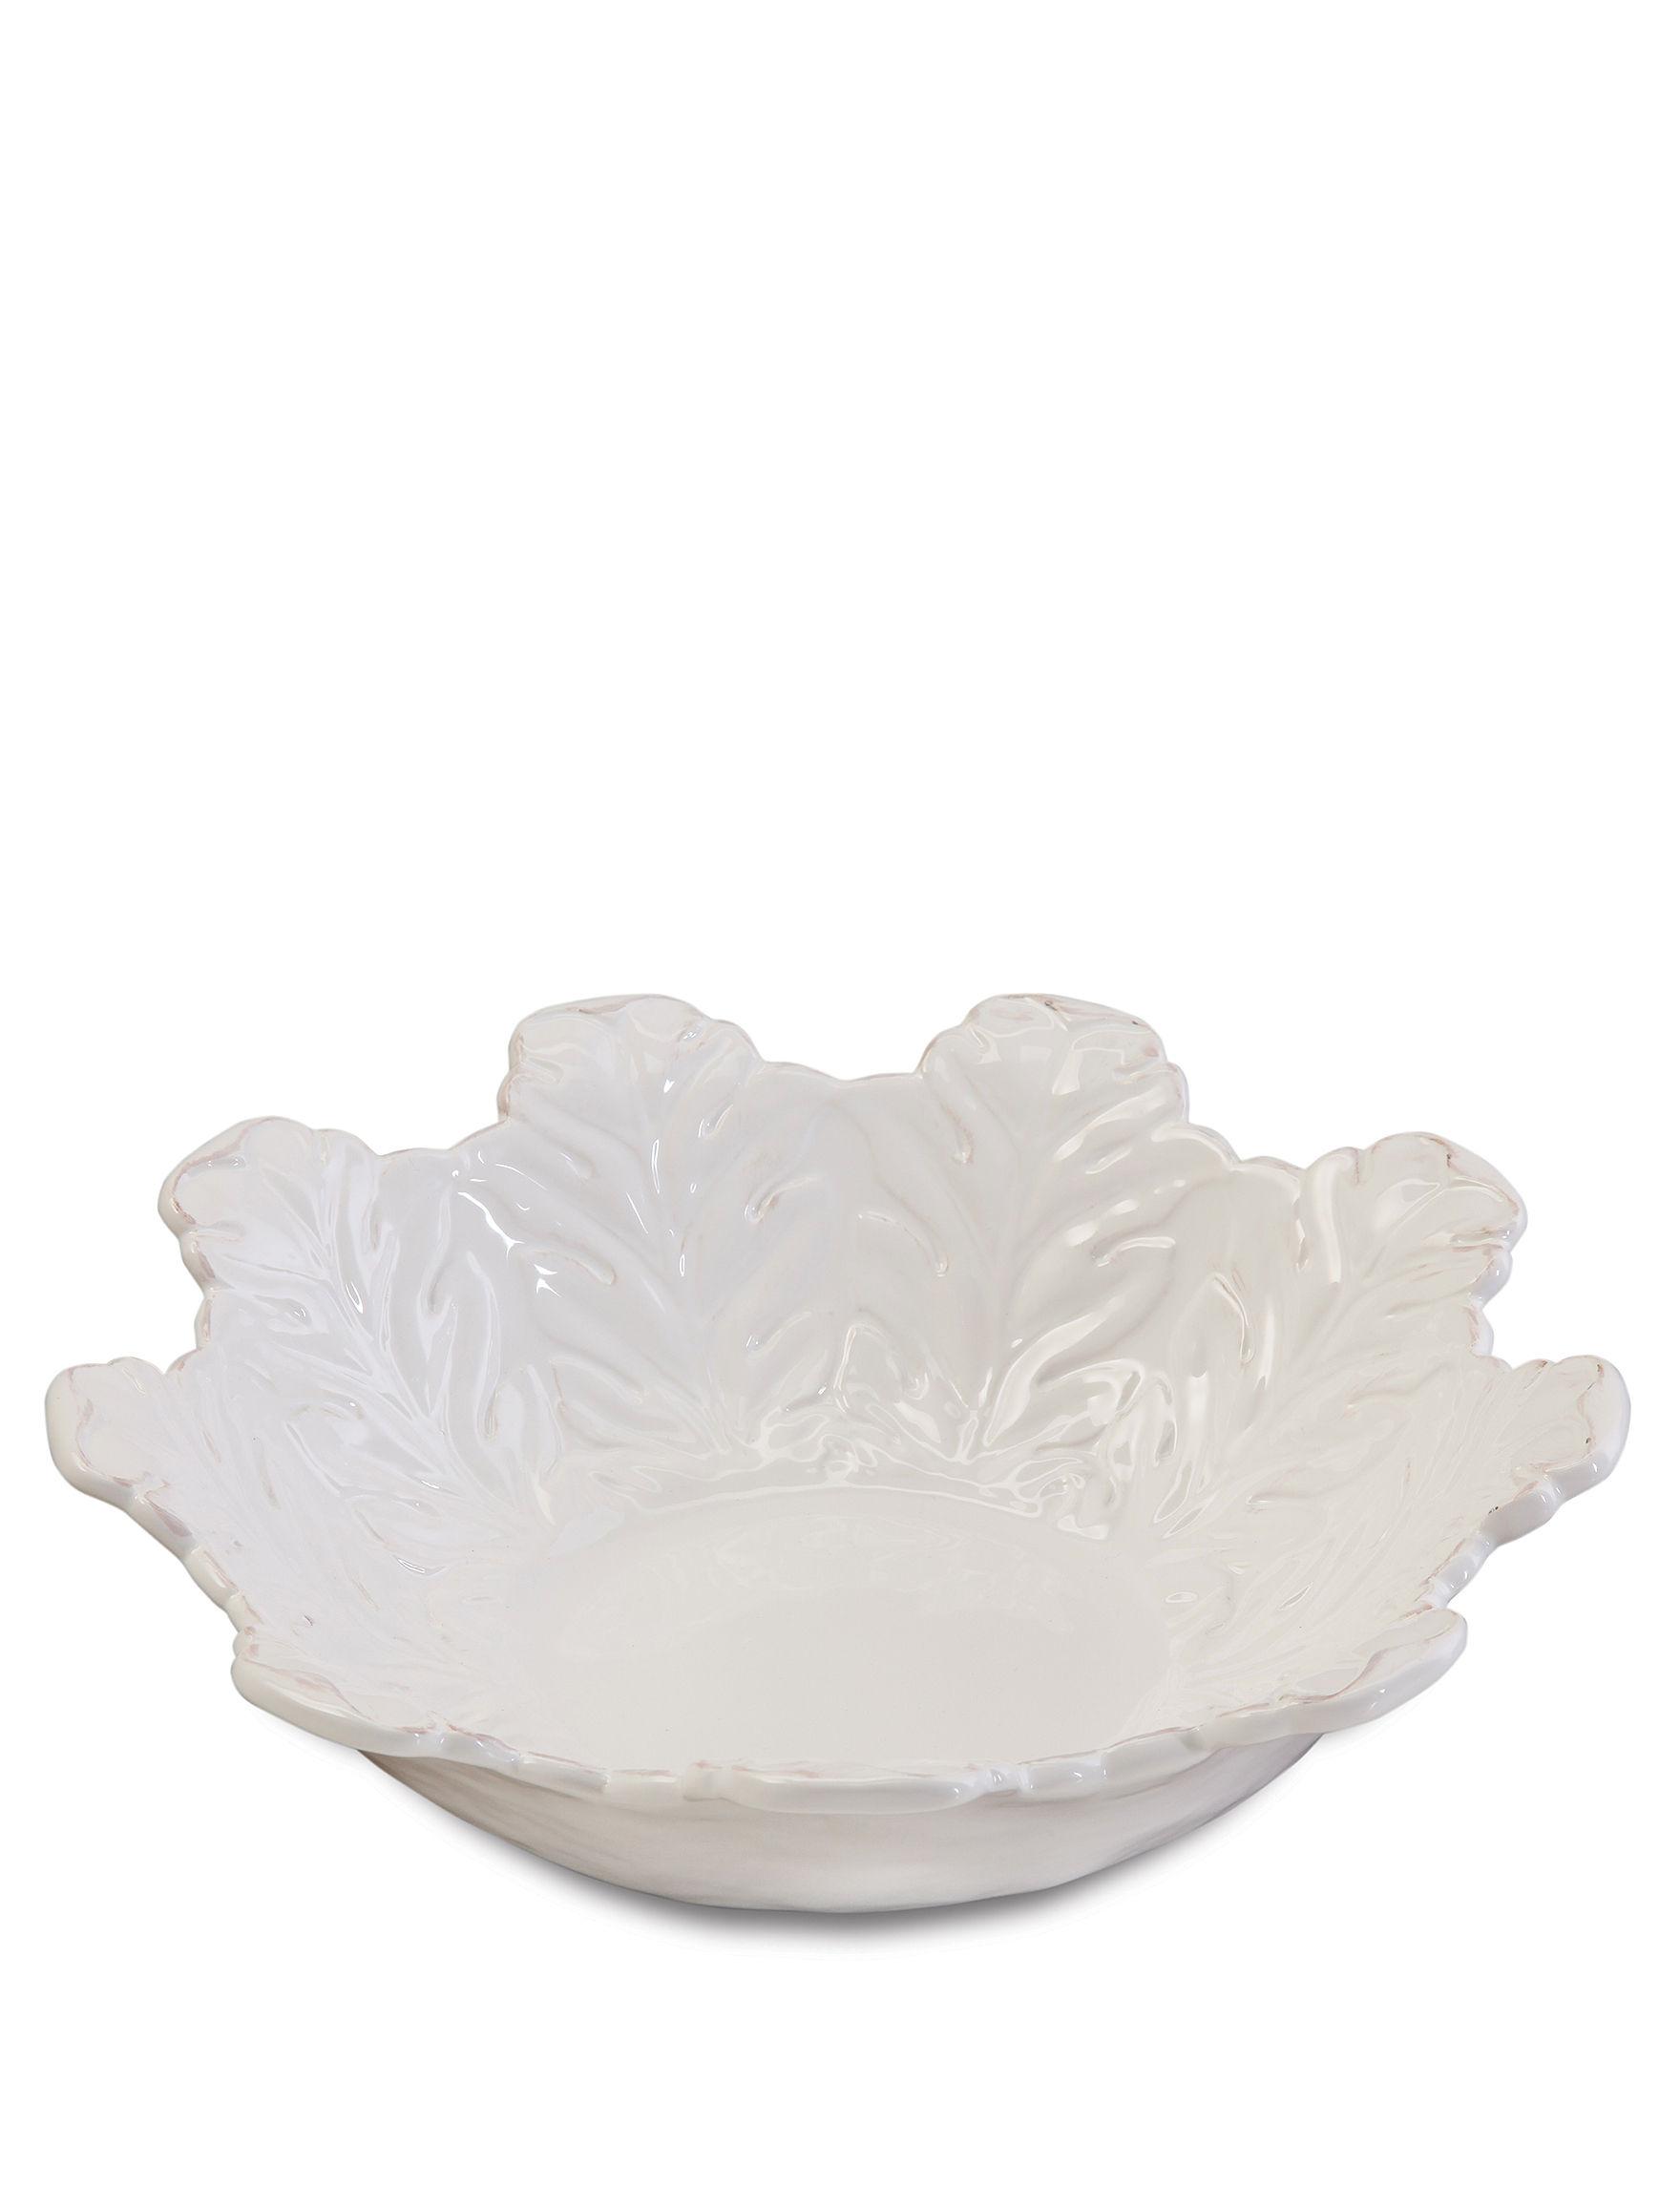 Gibson White Serving Bowls Serveware